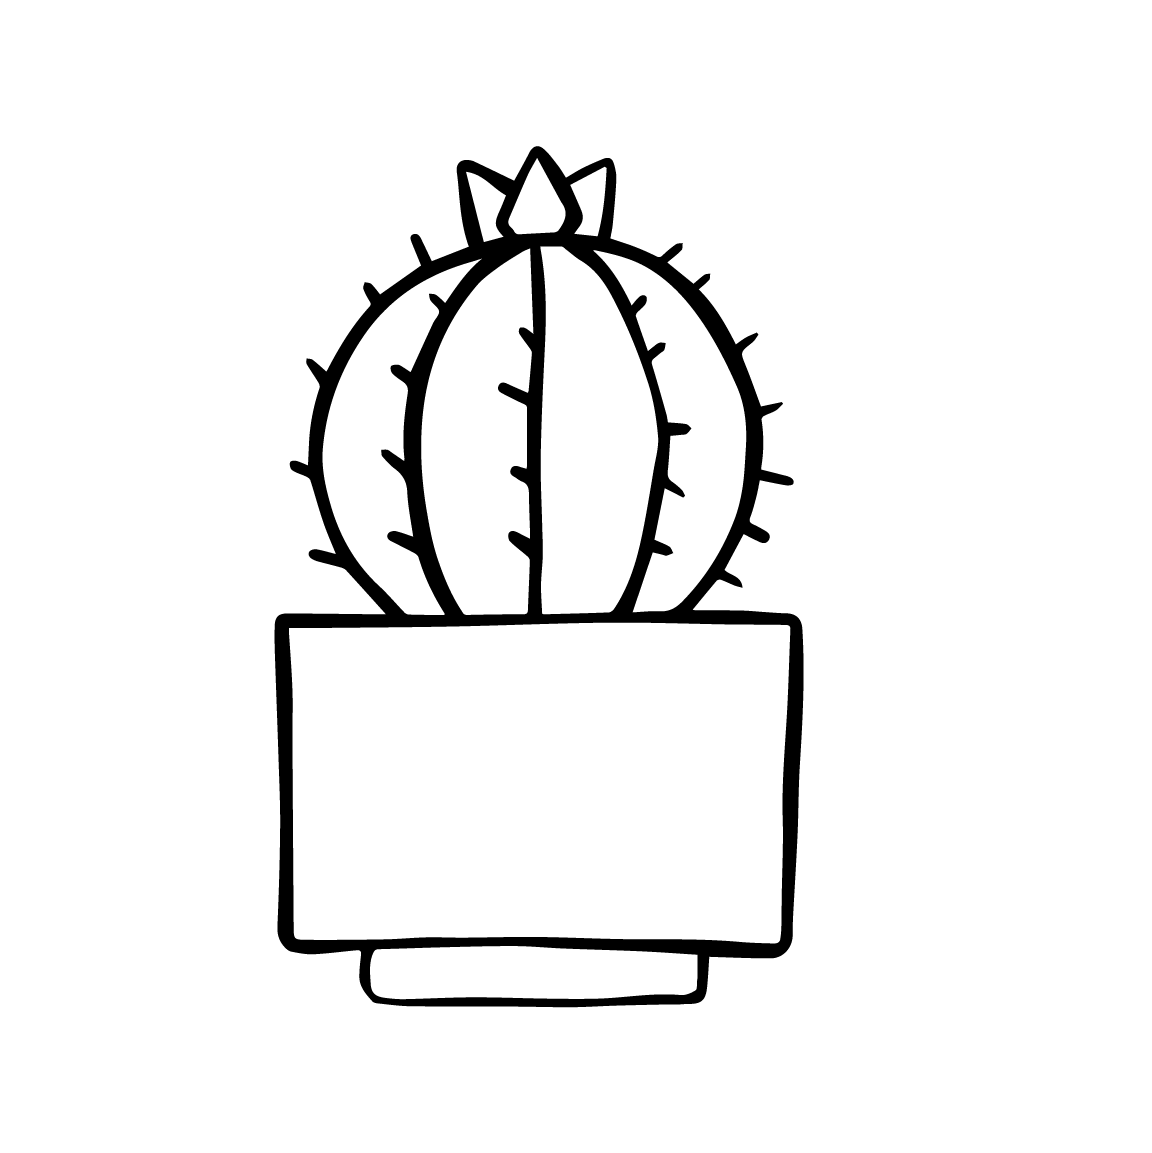 Cactus_Black_8.png